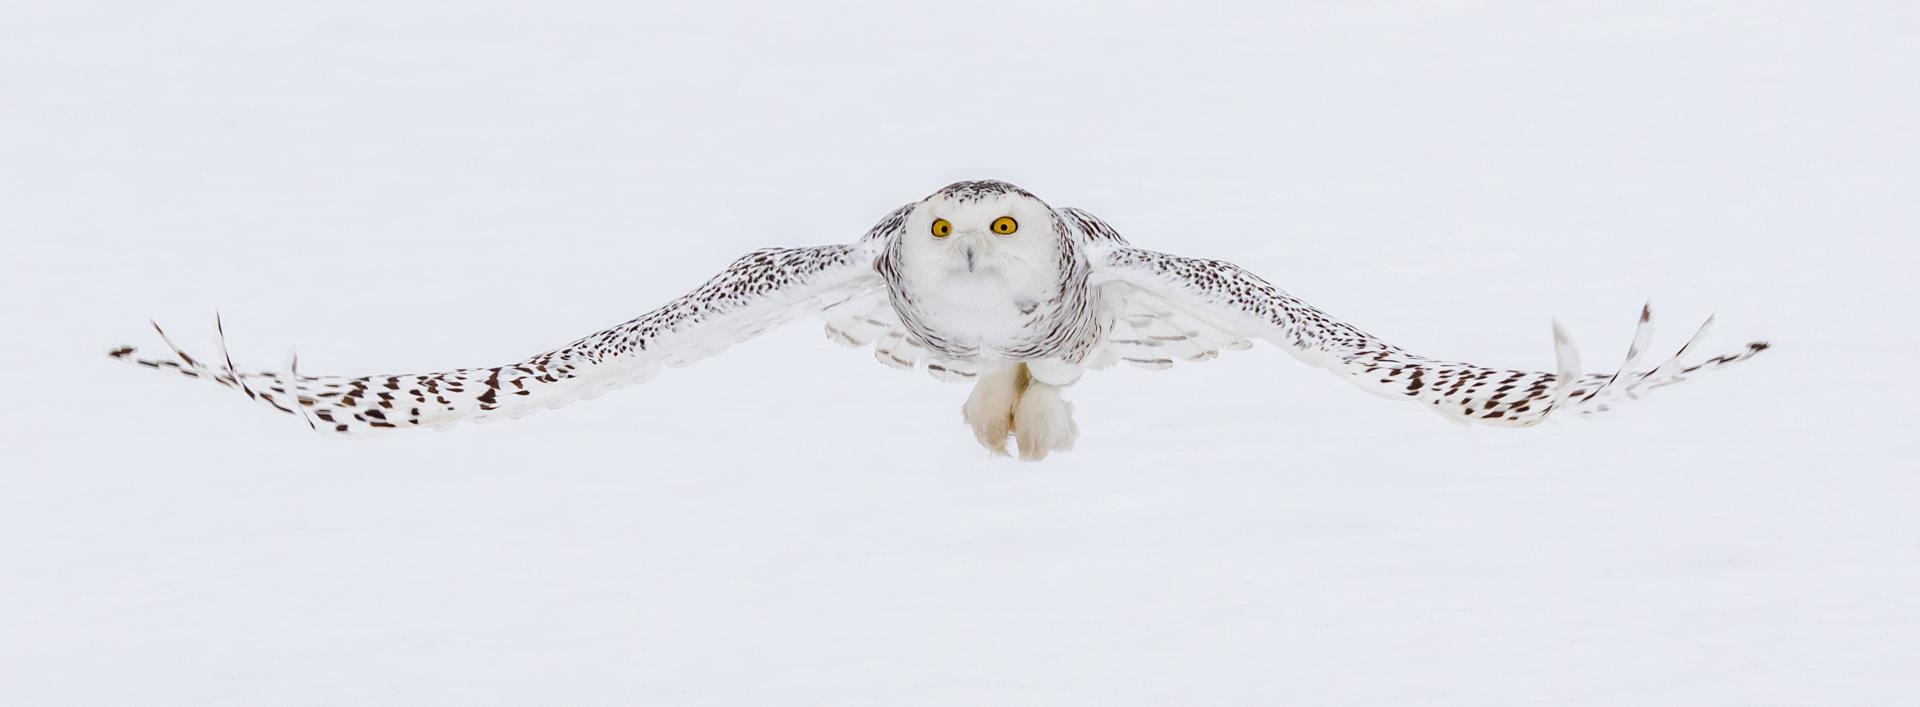 Snow Wraith By Bruce Hollingsworth